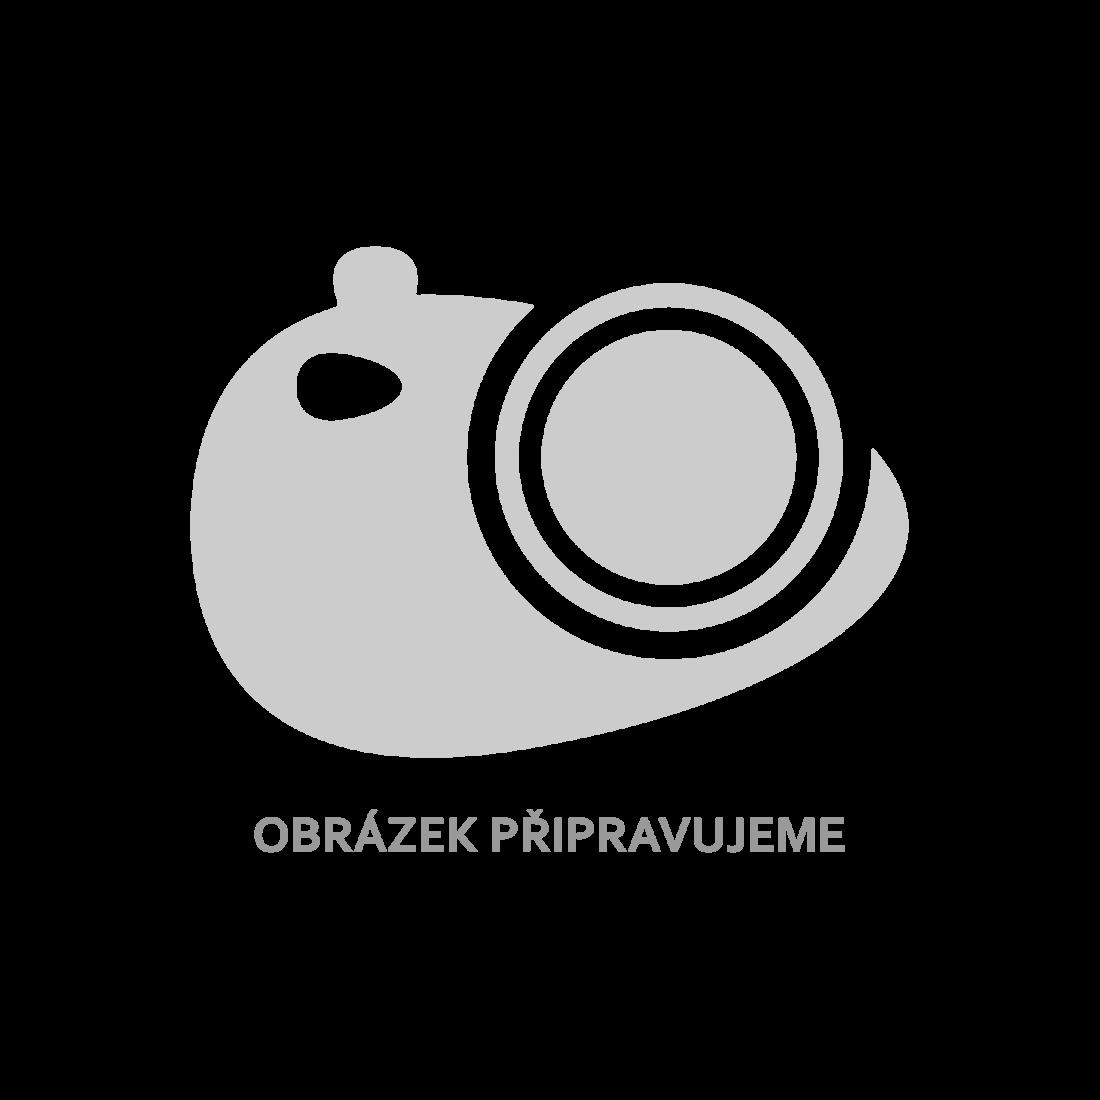 vidaXL Knihovna černá s vysokým leskem 40 x 35 x 180 cm dřevotříska [803405]